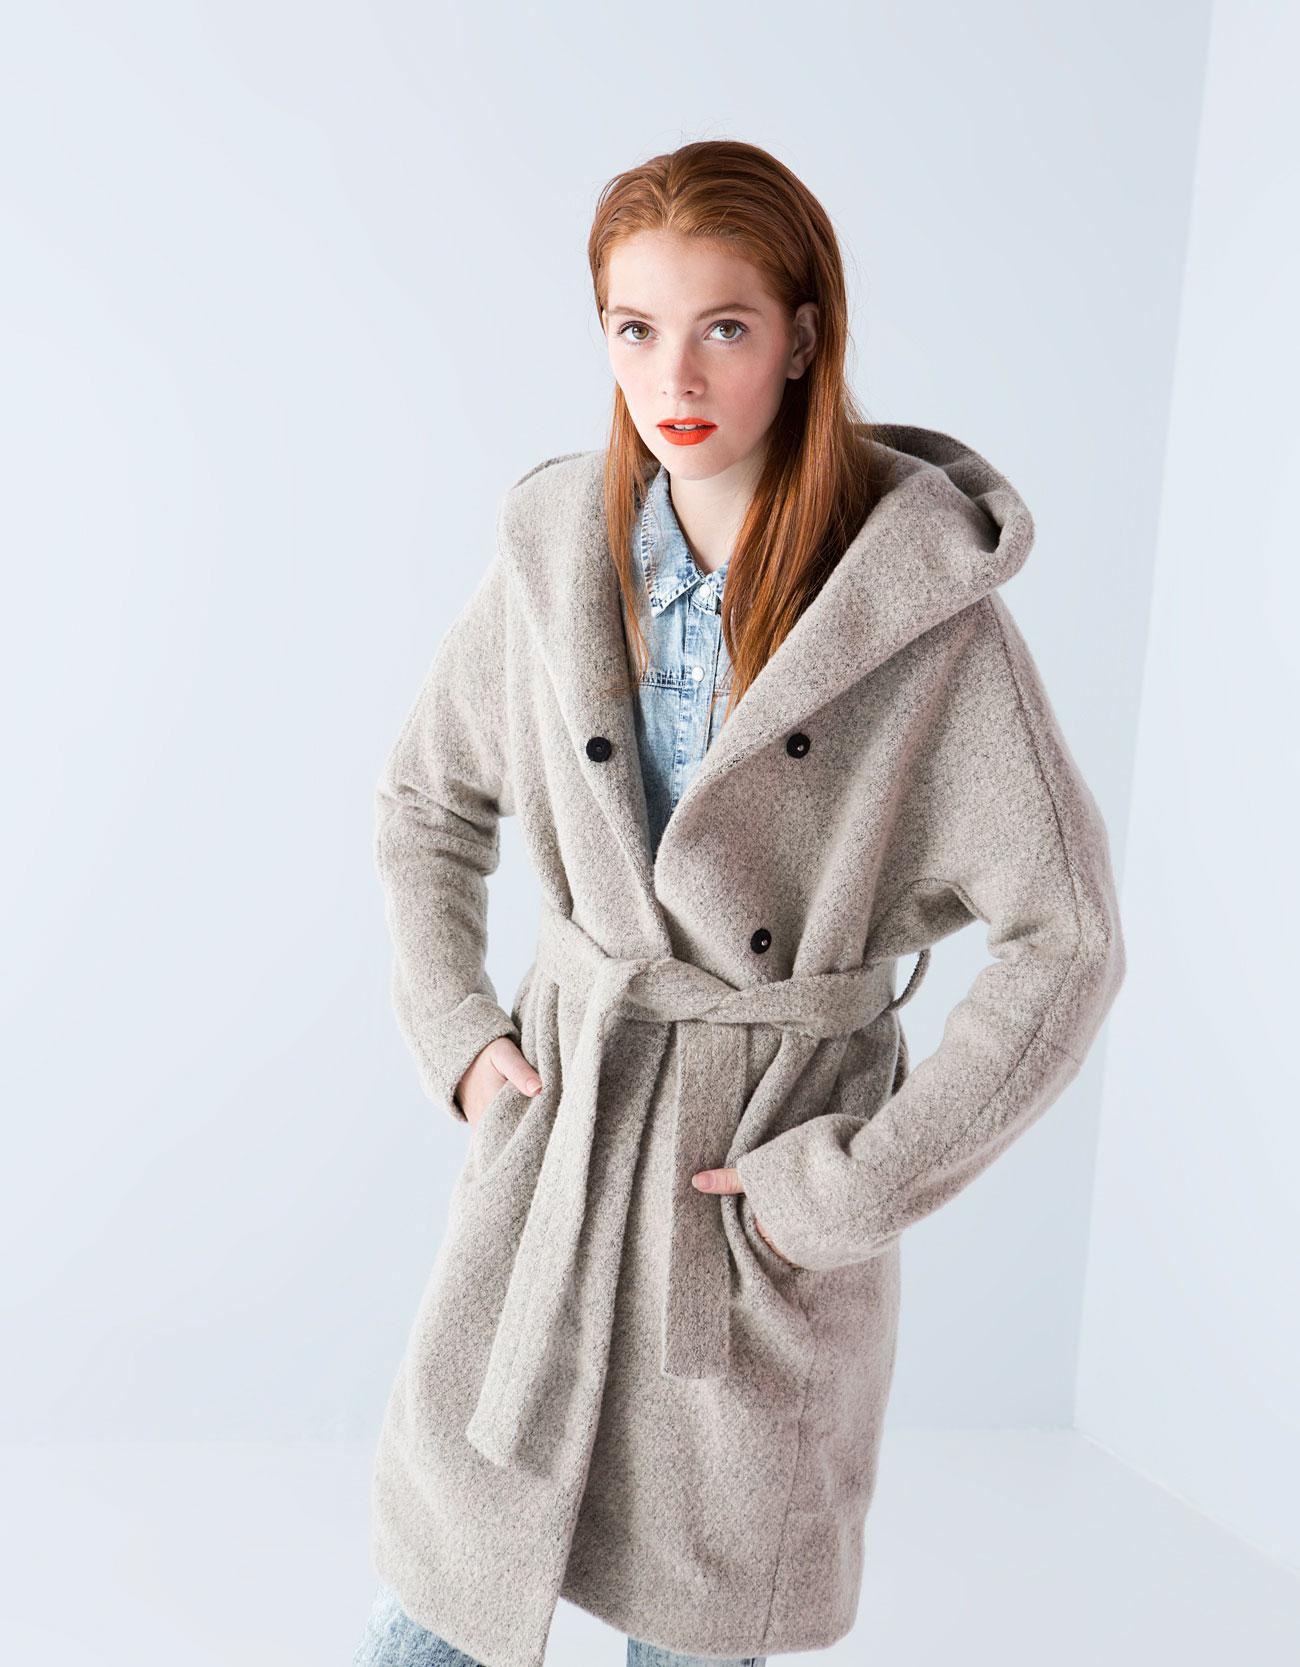 http://www.bershka.com/ch/en/woman/sale/coats-%26-jackets/bershka-belt-detail-coat-c1270663p4260529c318.html